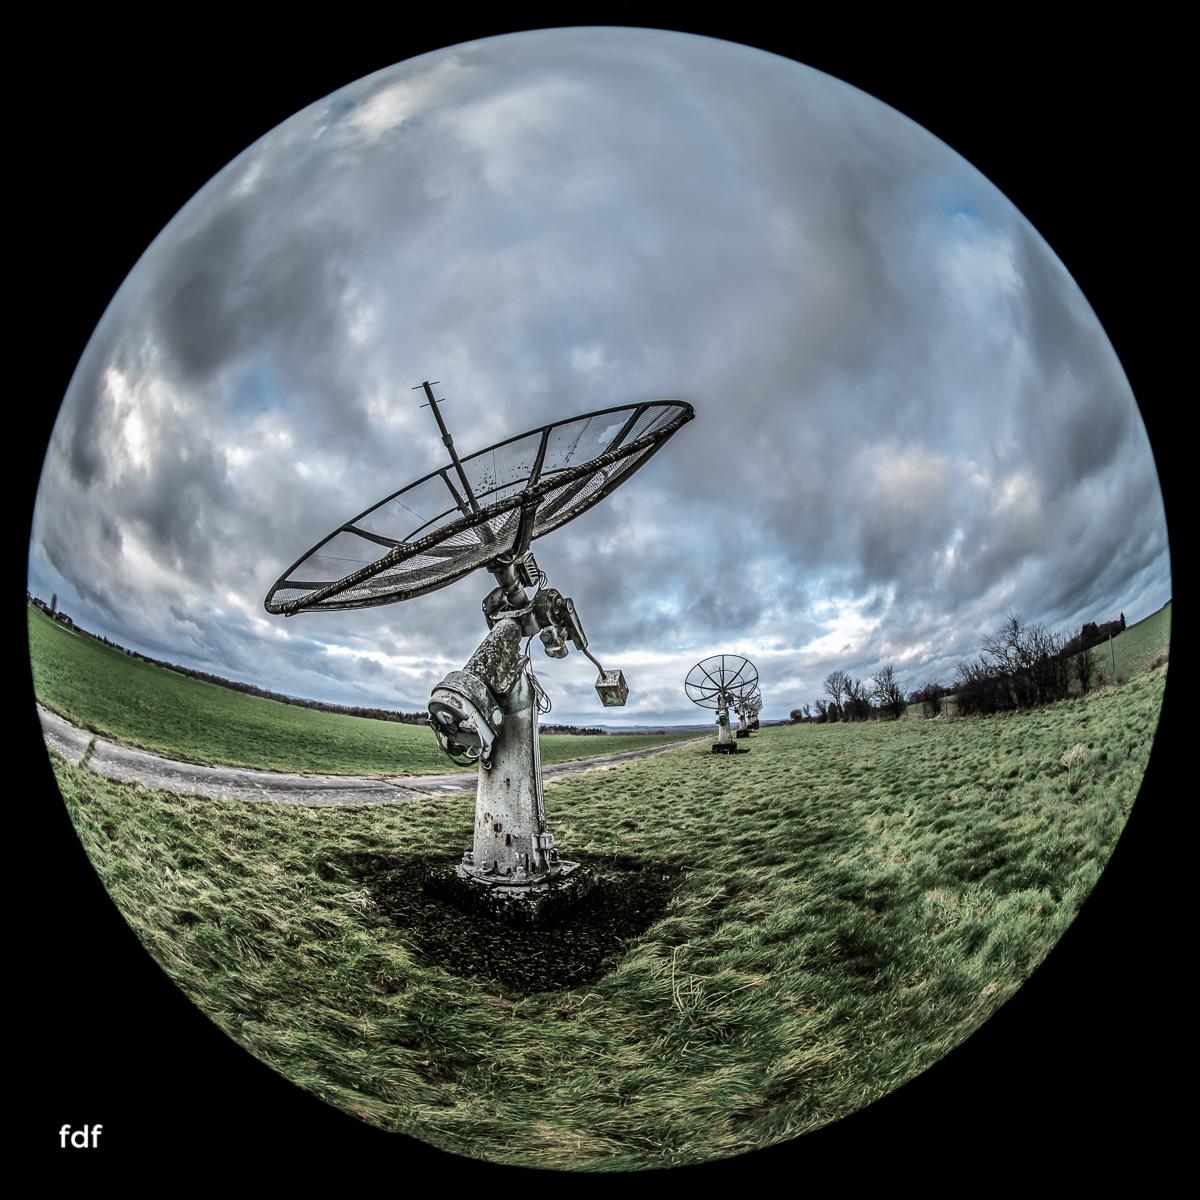 Outer-Space-Radioteleskop-Antennen-Belgien-Urbex-Los-Place-16.jpg